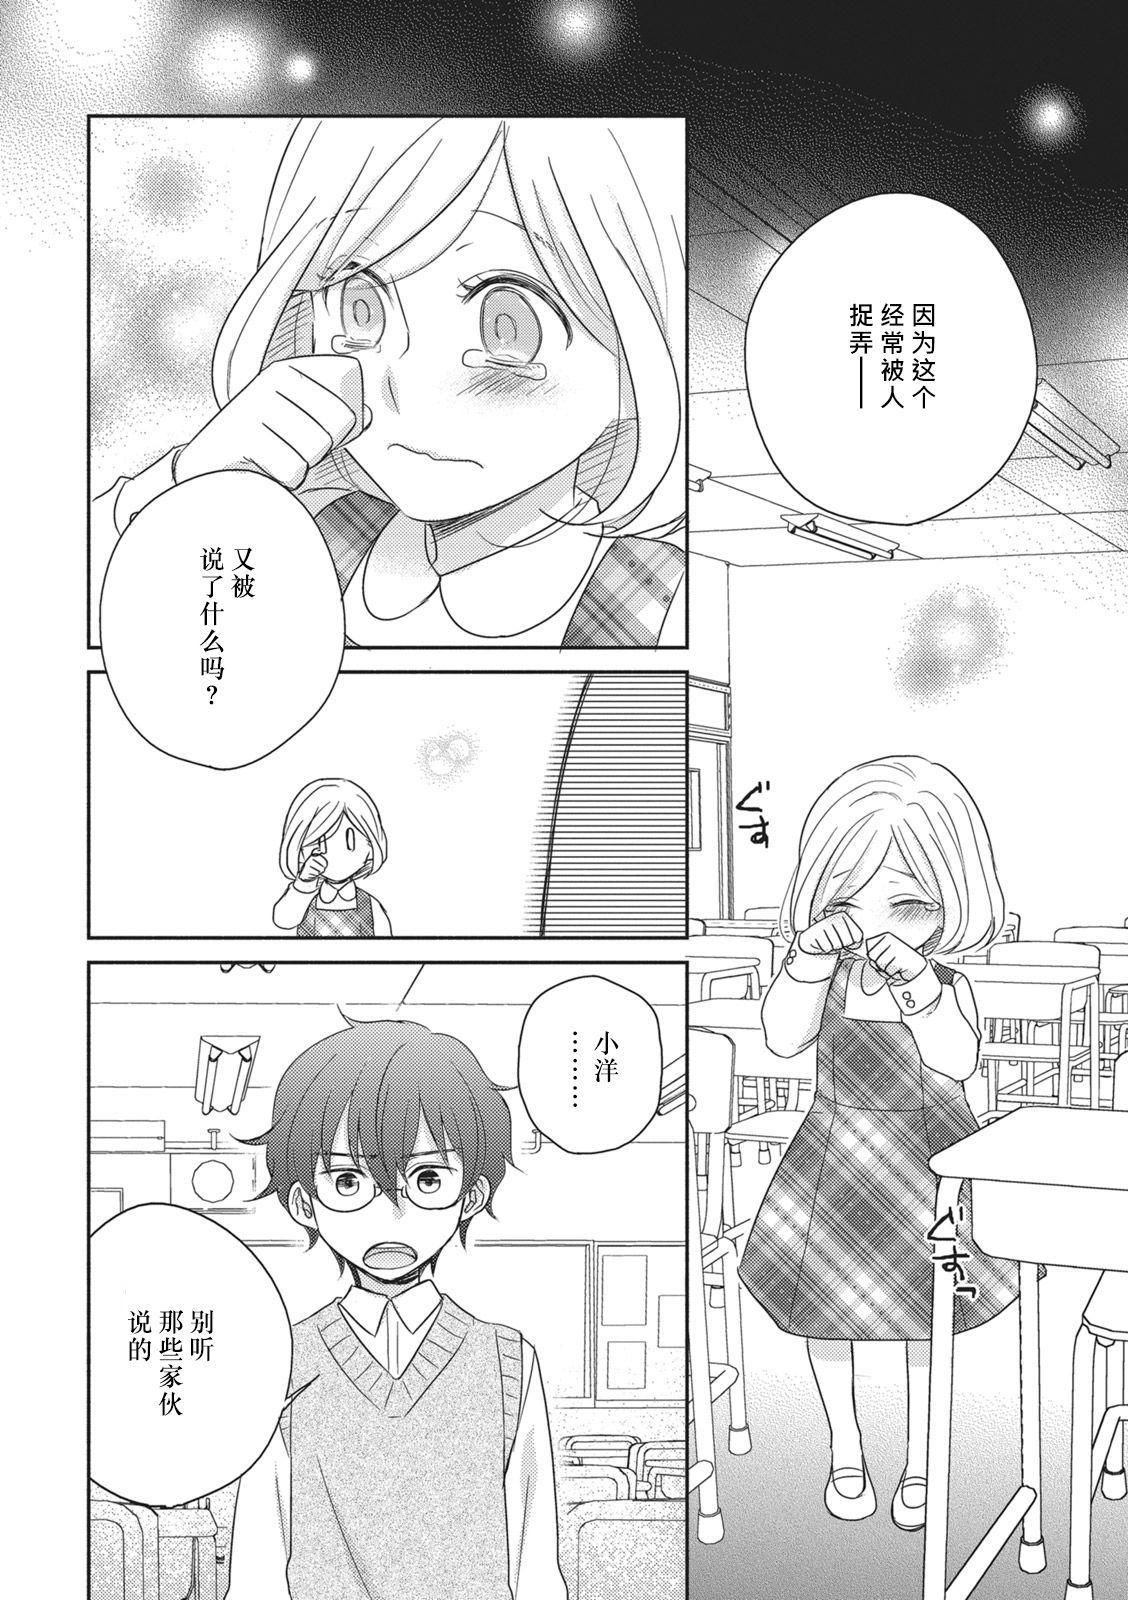 HaTsuKoi LOGIC | 初恋逻辑 7